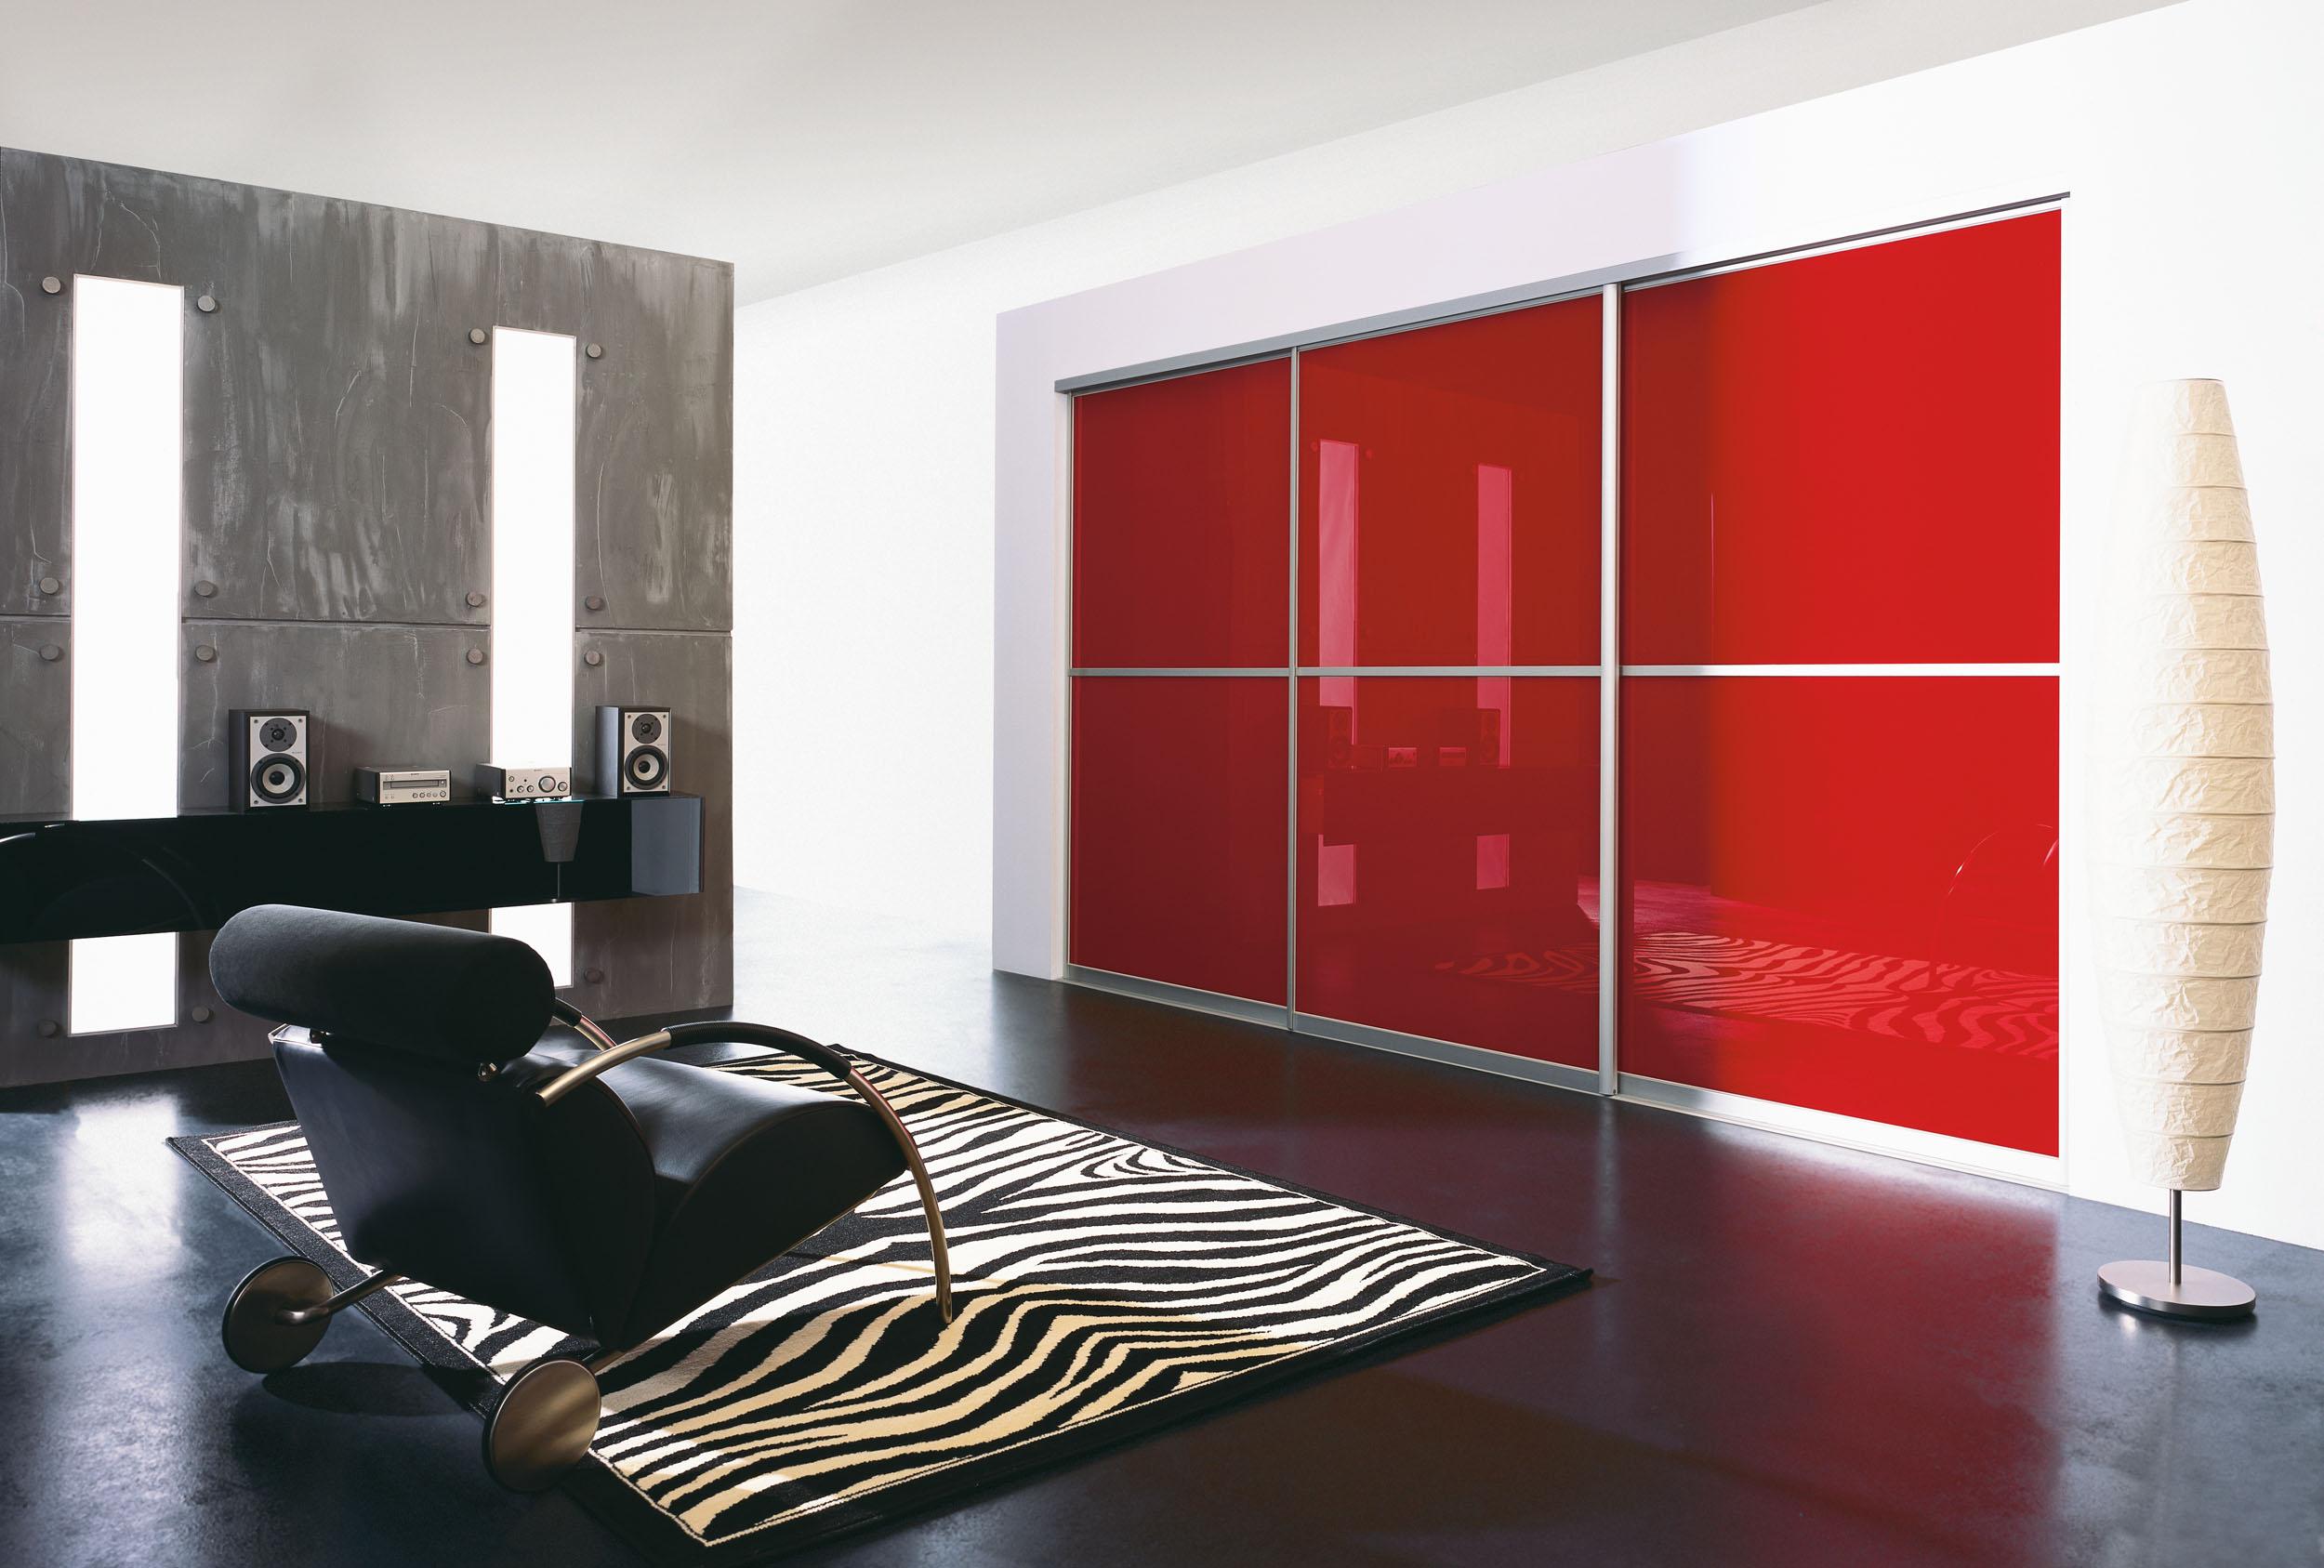 Шкаф-купе красного цвета негативно влияет на сон